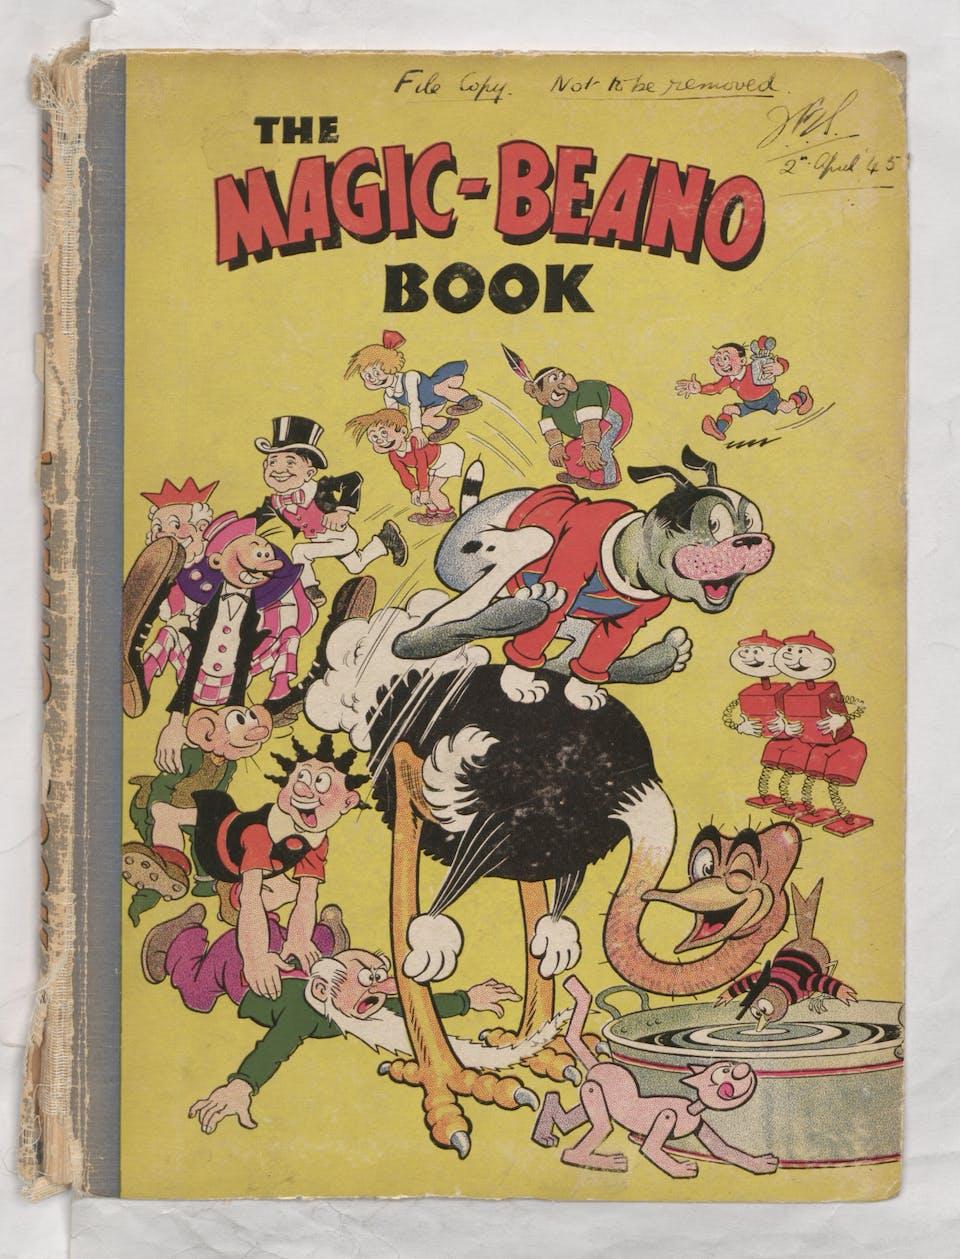 1945 Magic-Beano Book - Annual Cover